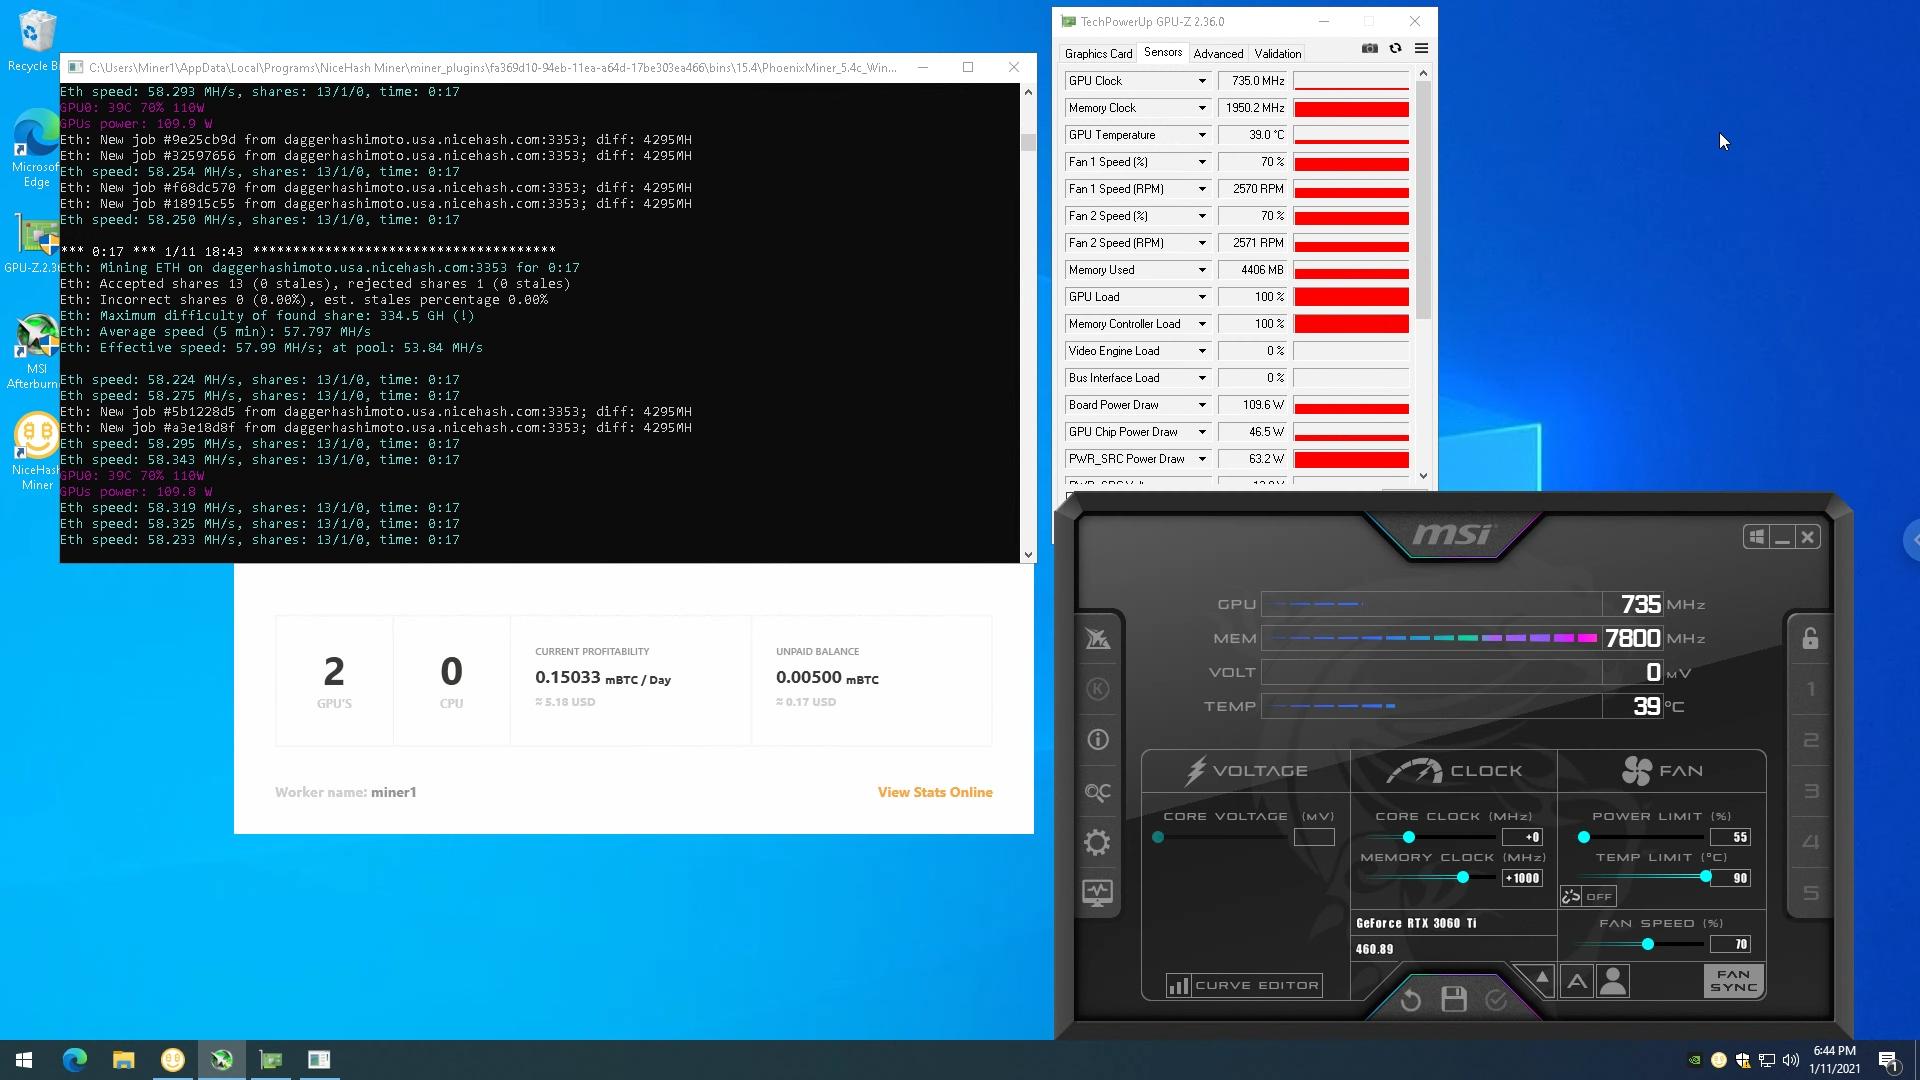 Screenshot 2021-01-11 at 6.44.09 PM.png